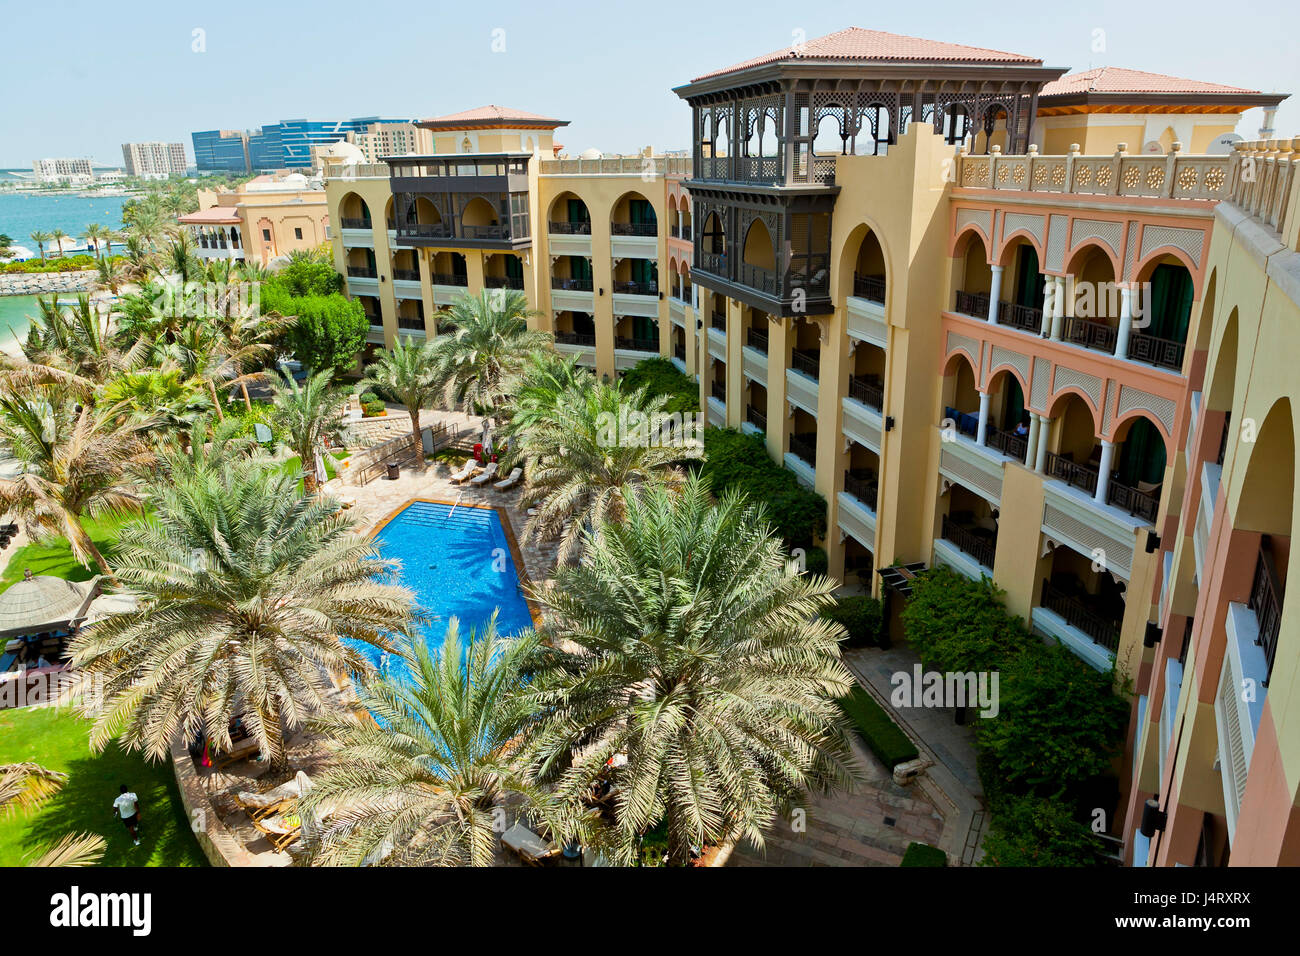 the shangri la hotel abu dhabi, views across the canal Stock Photo